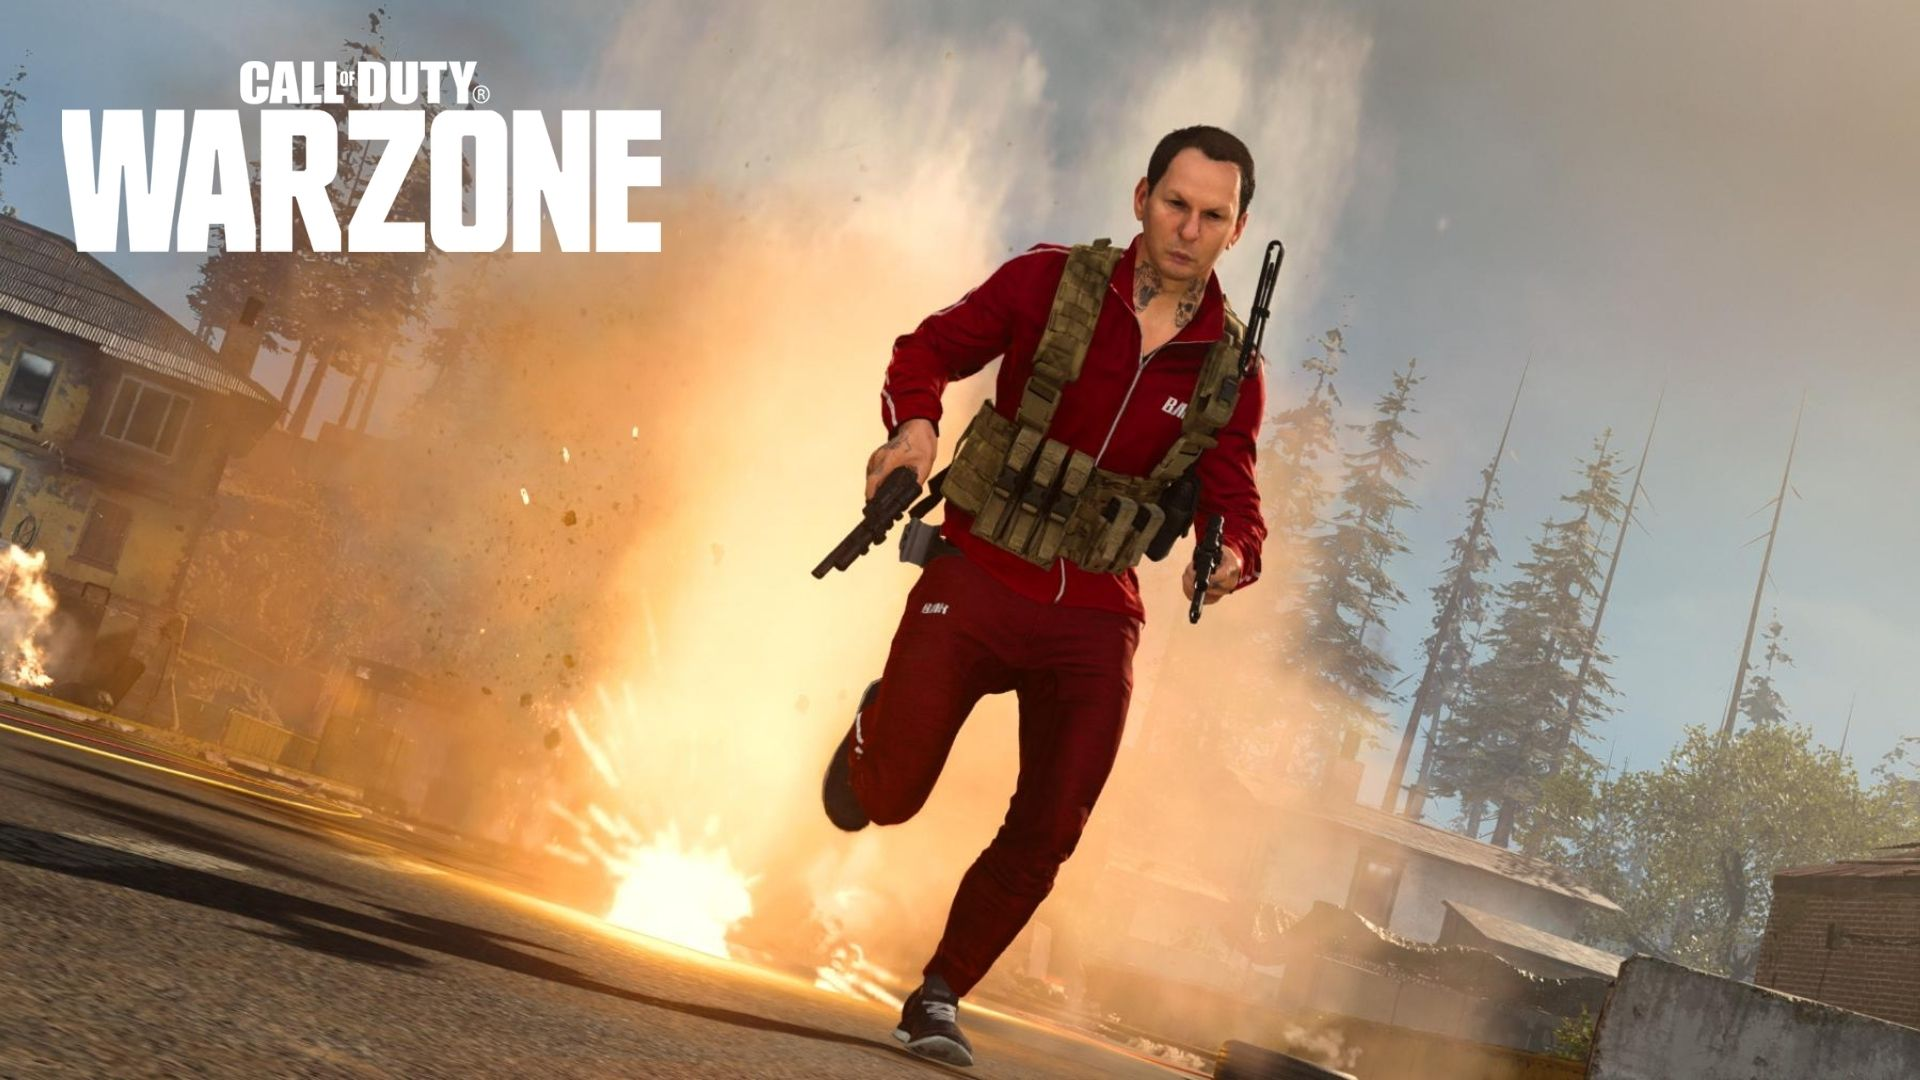 warzone running